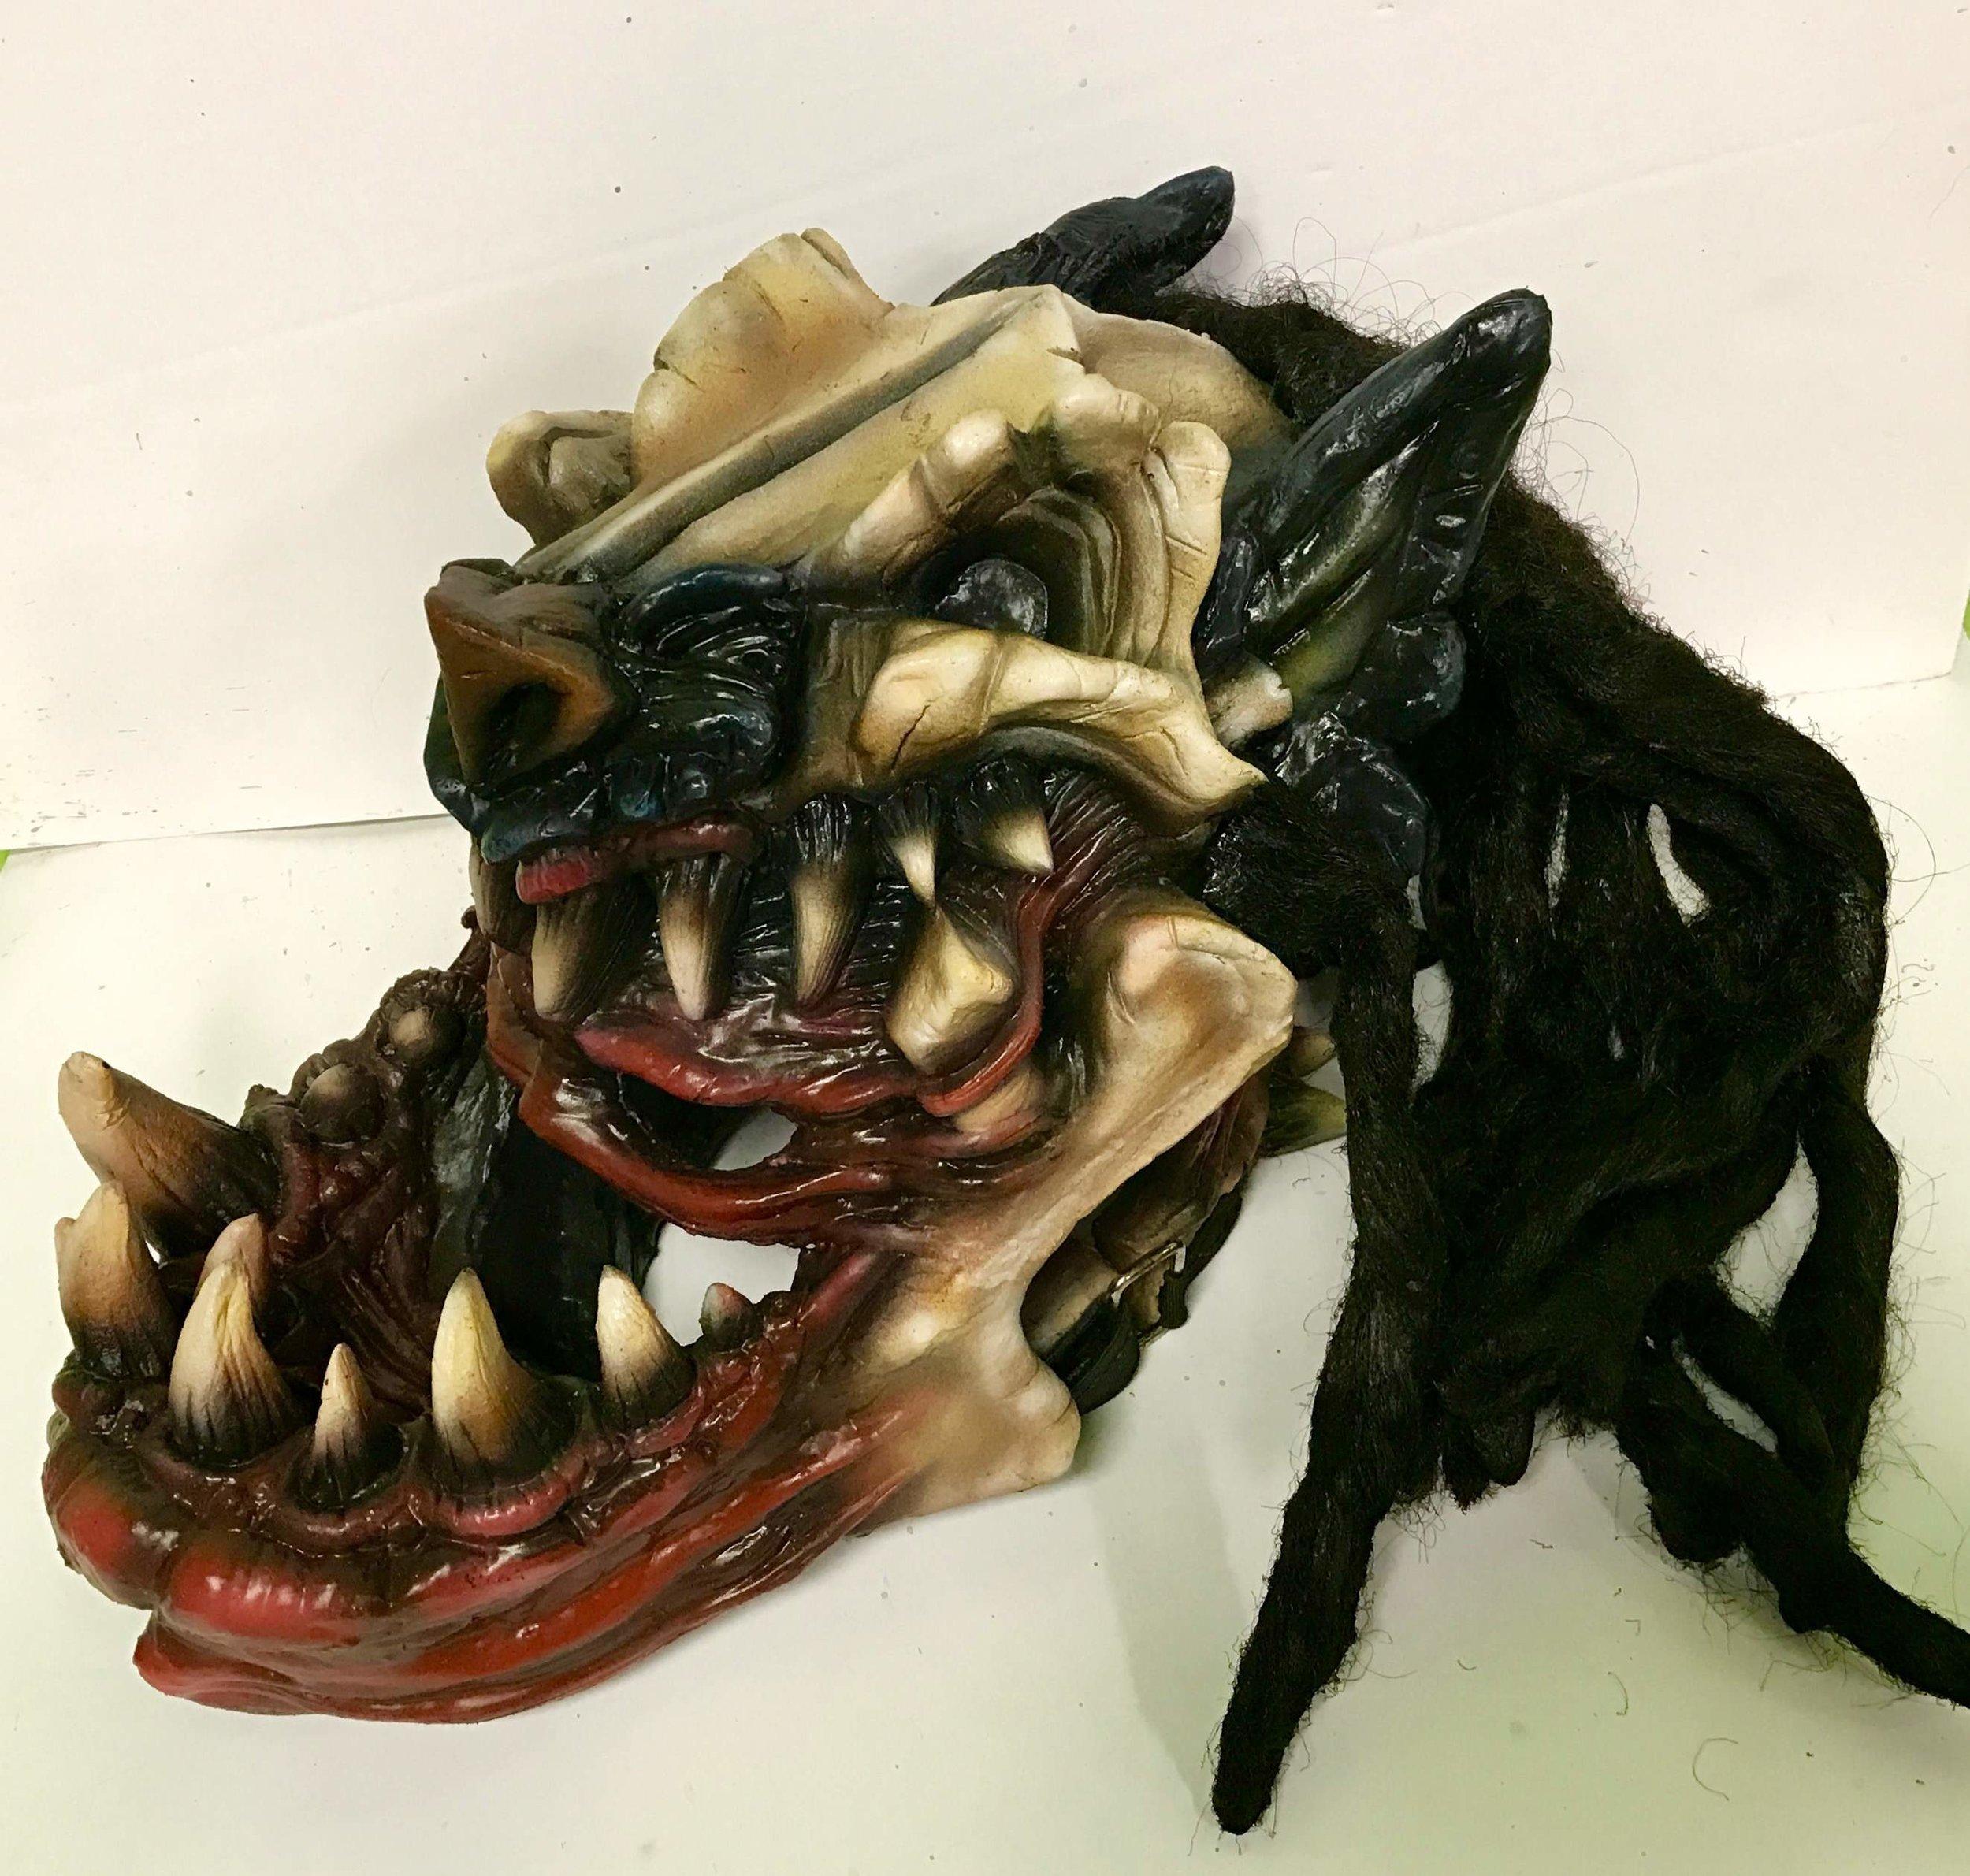 Jizmak's Mask